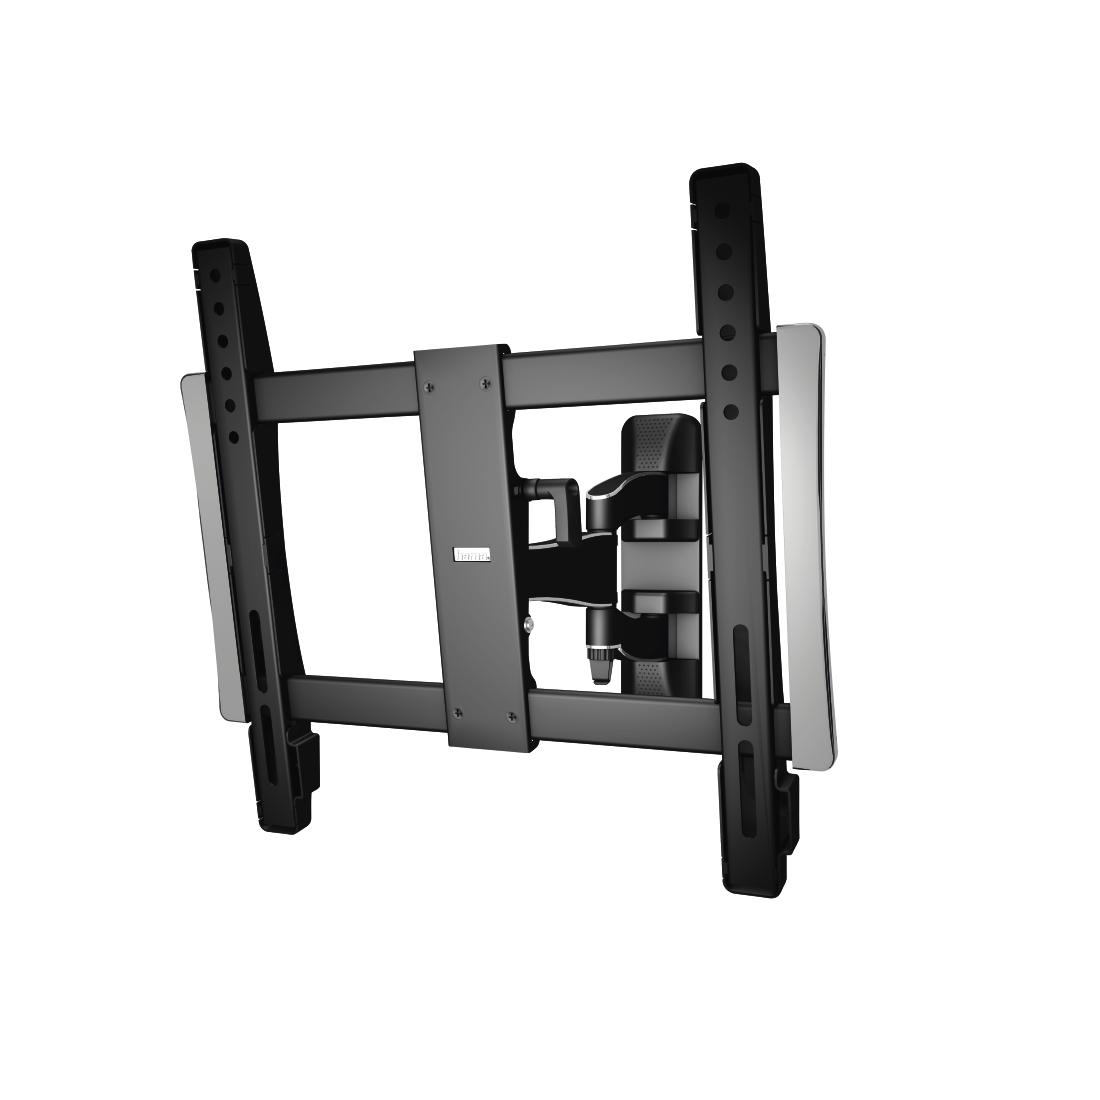 00118056 hama tv wandhalterung fullmotion premium vesa 400x400 165cm 65 schwarz hama de. Black Bedroom Furniture Sets. Home Design Ideas